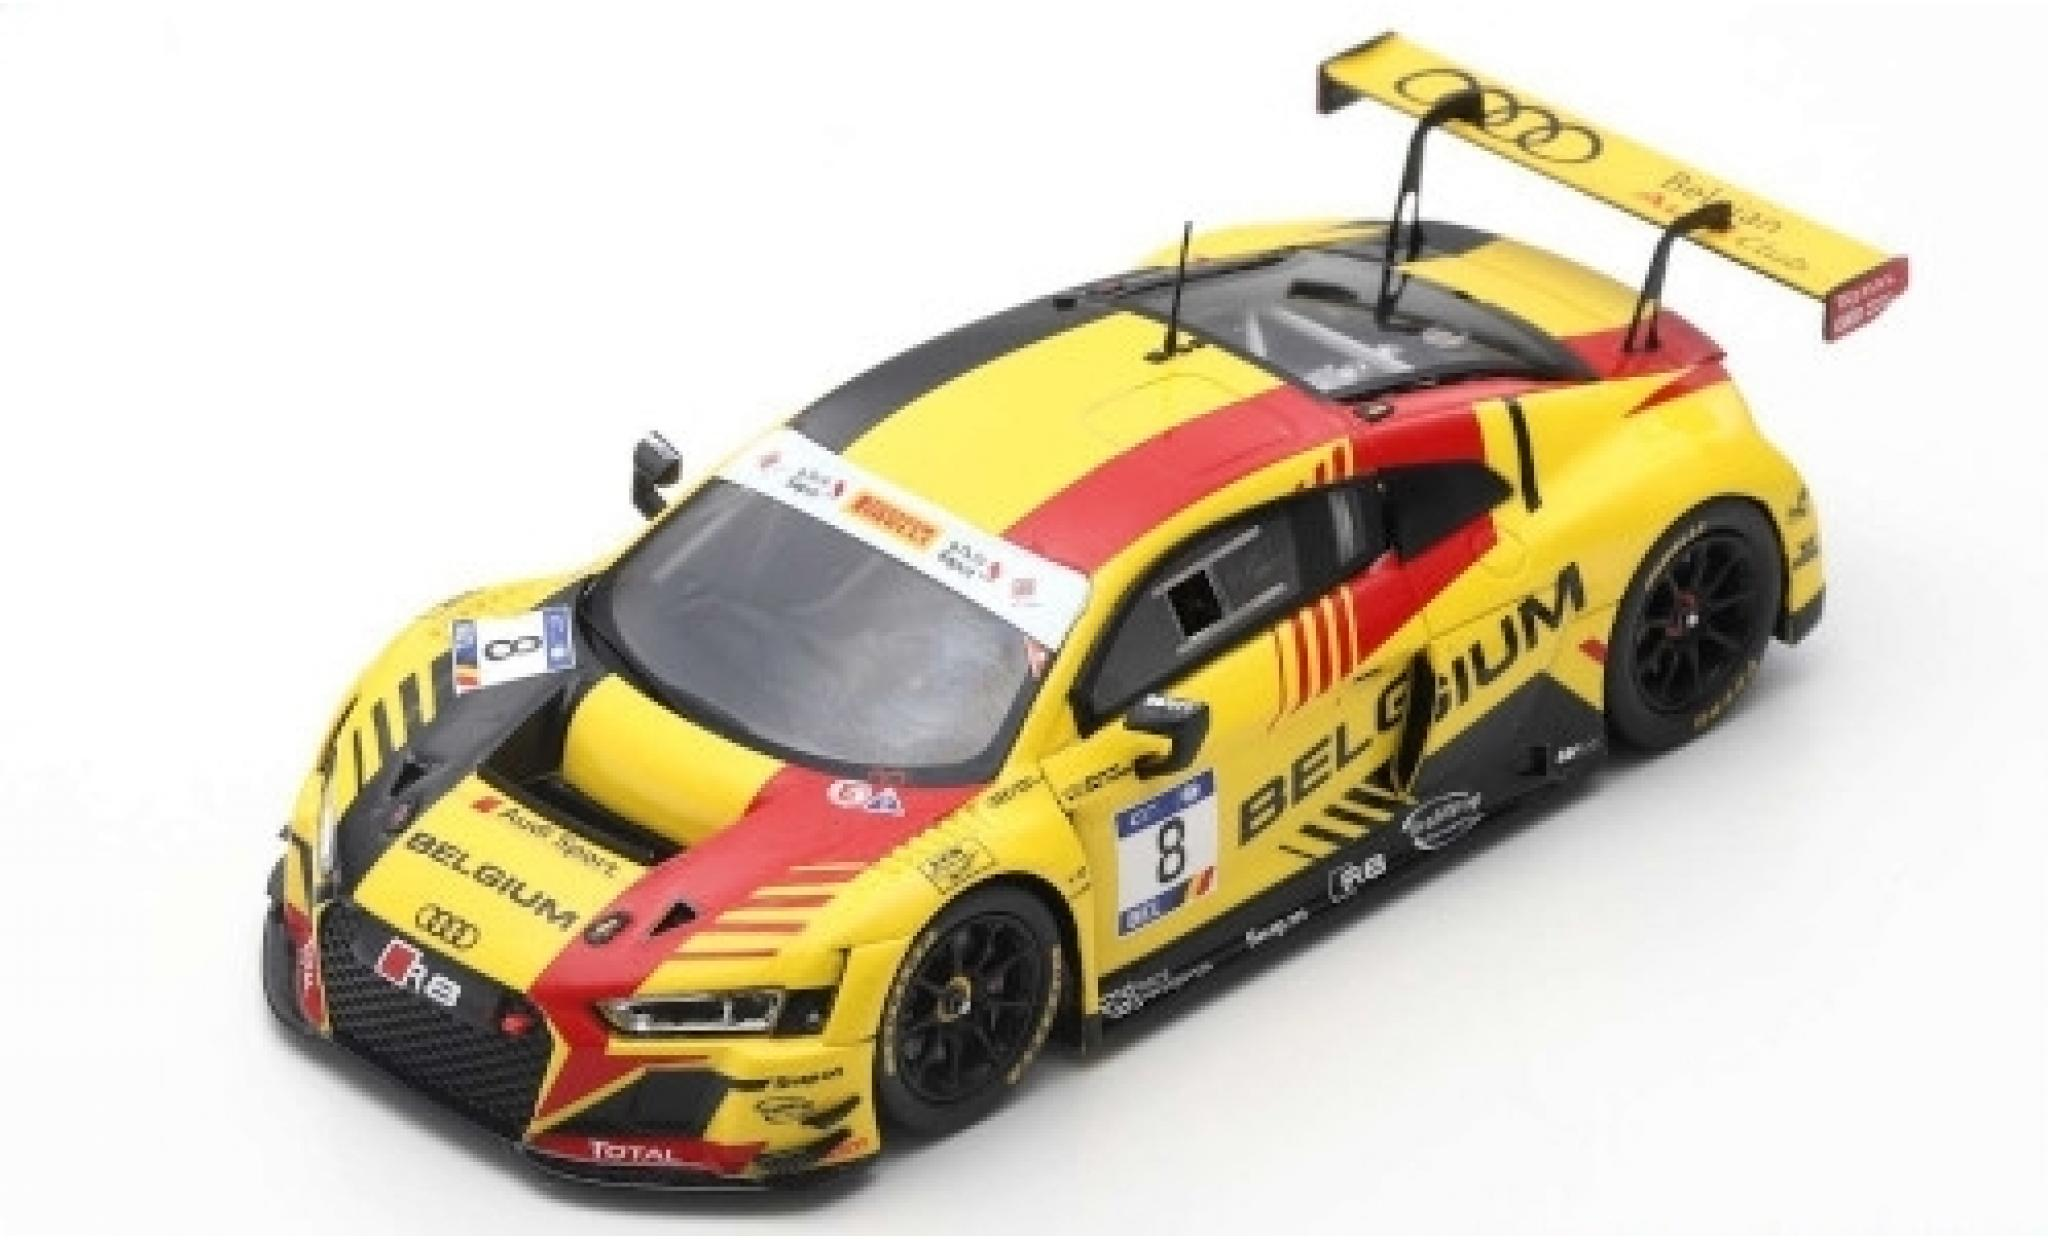 Audi R8 1/43 Spark LMS No.8 Belgian Club Team WRT FIA GT Nations Cup Bahrain 2018 Team Belgium M.Den Tandt/C.Weerts